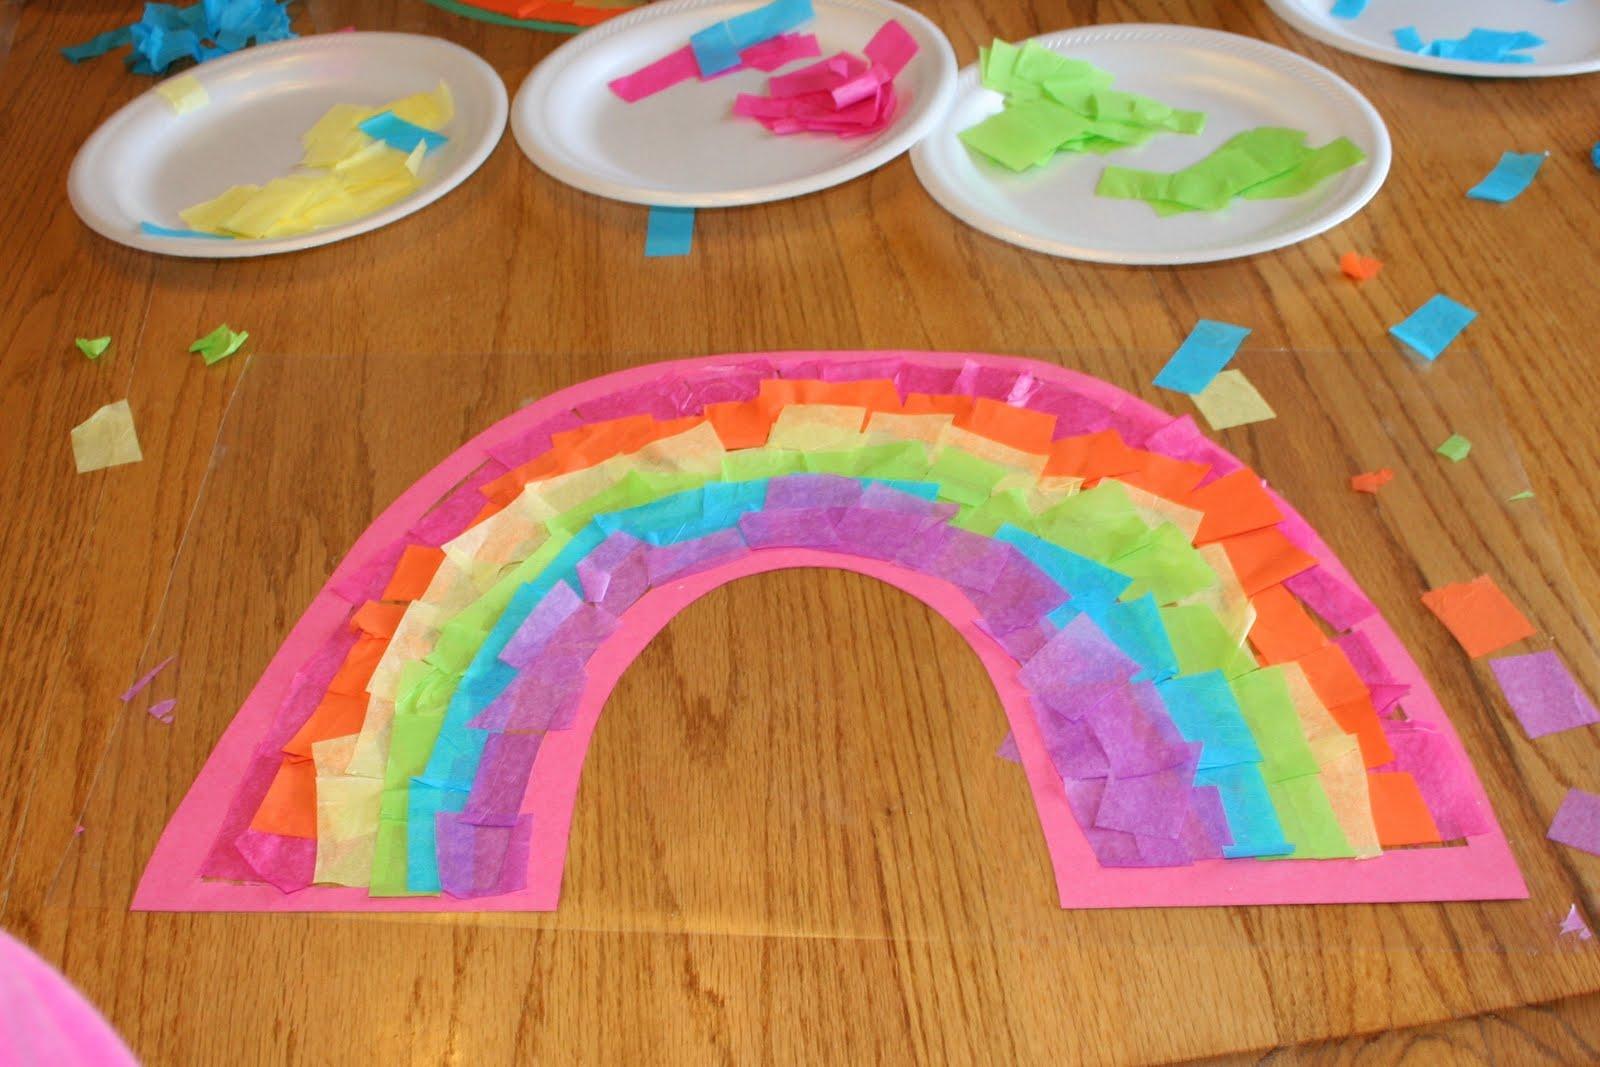 The Logan S Rainbow Craft Day